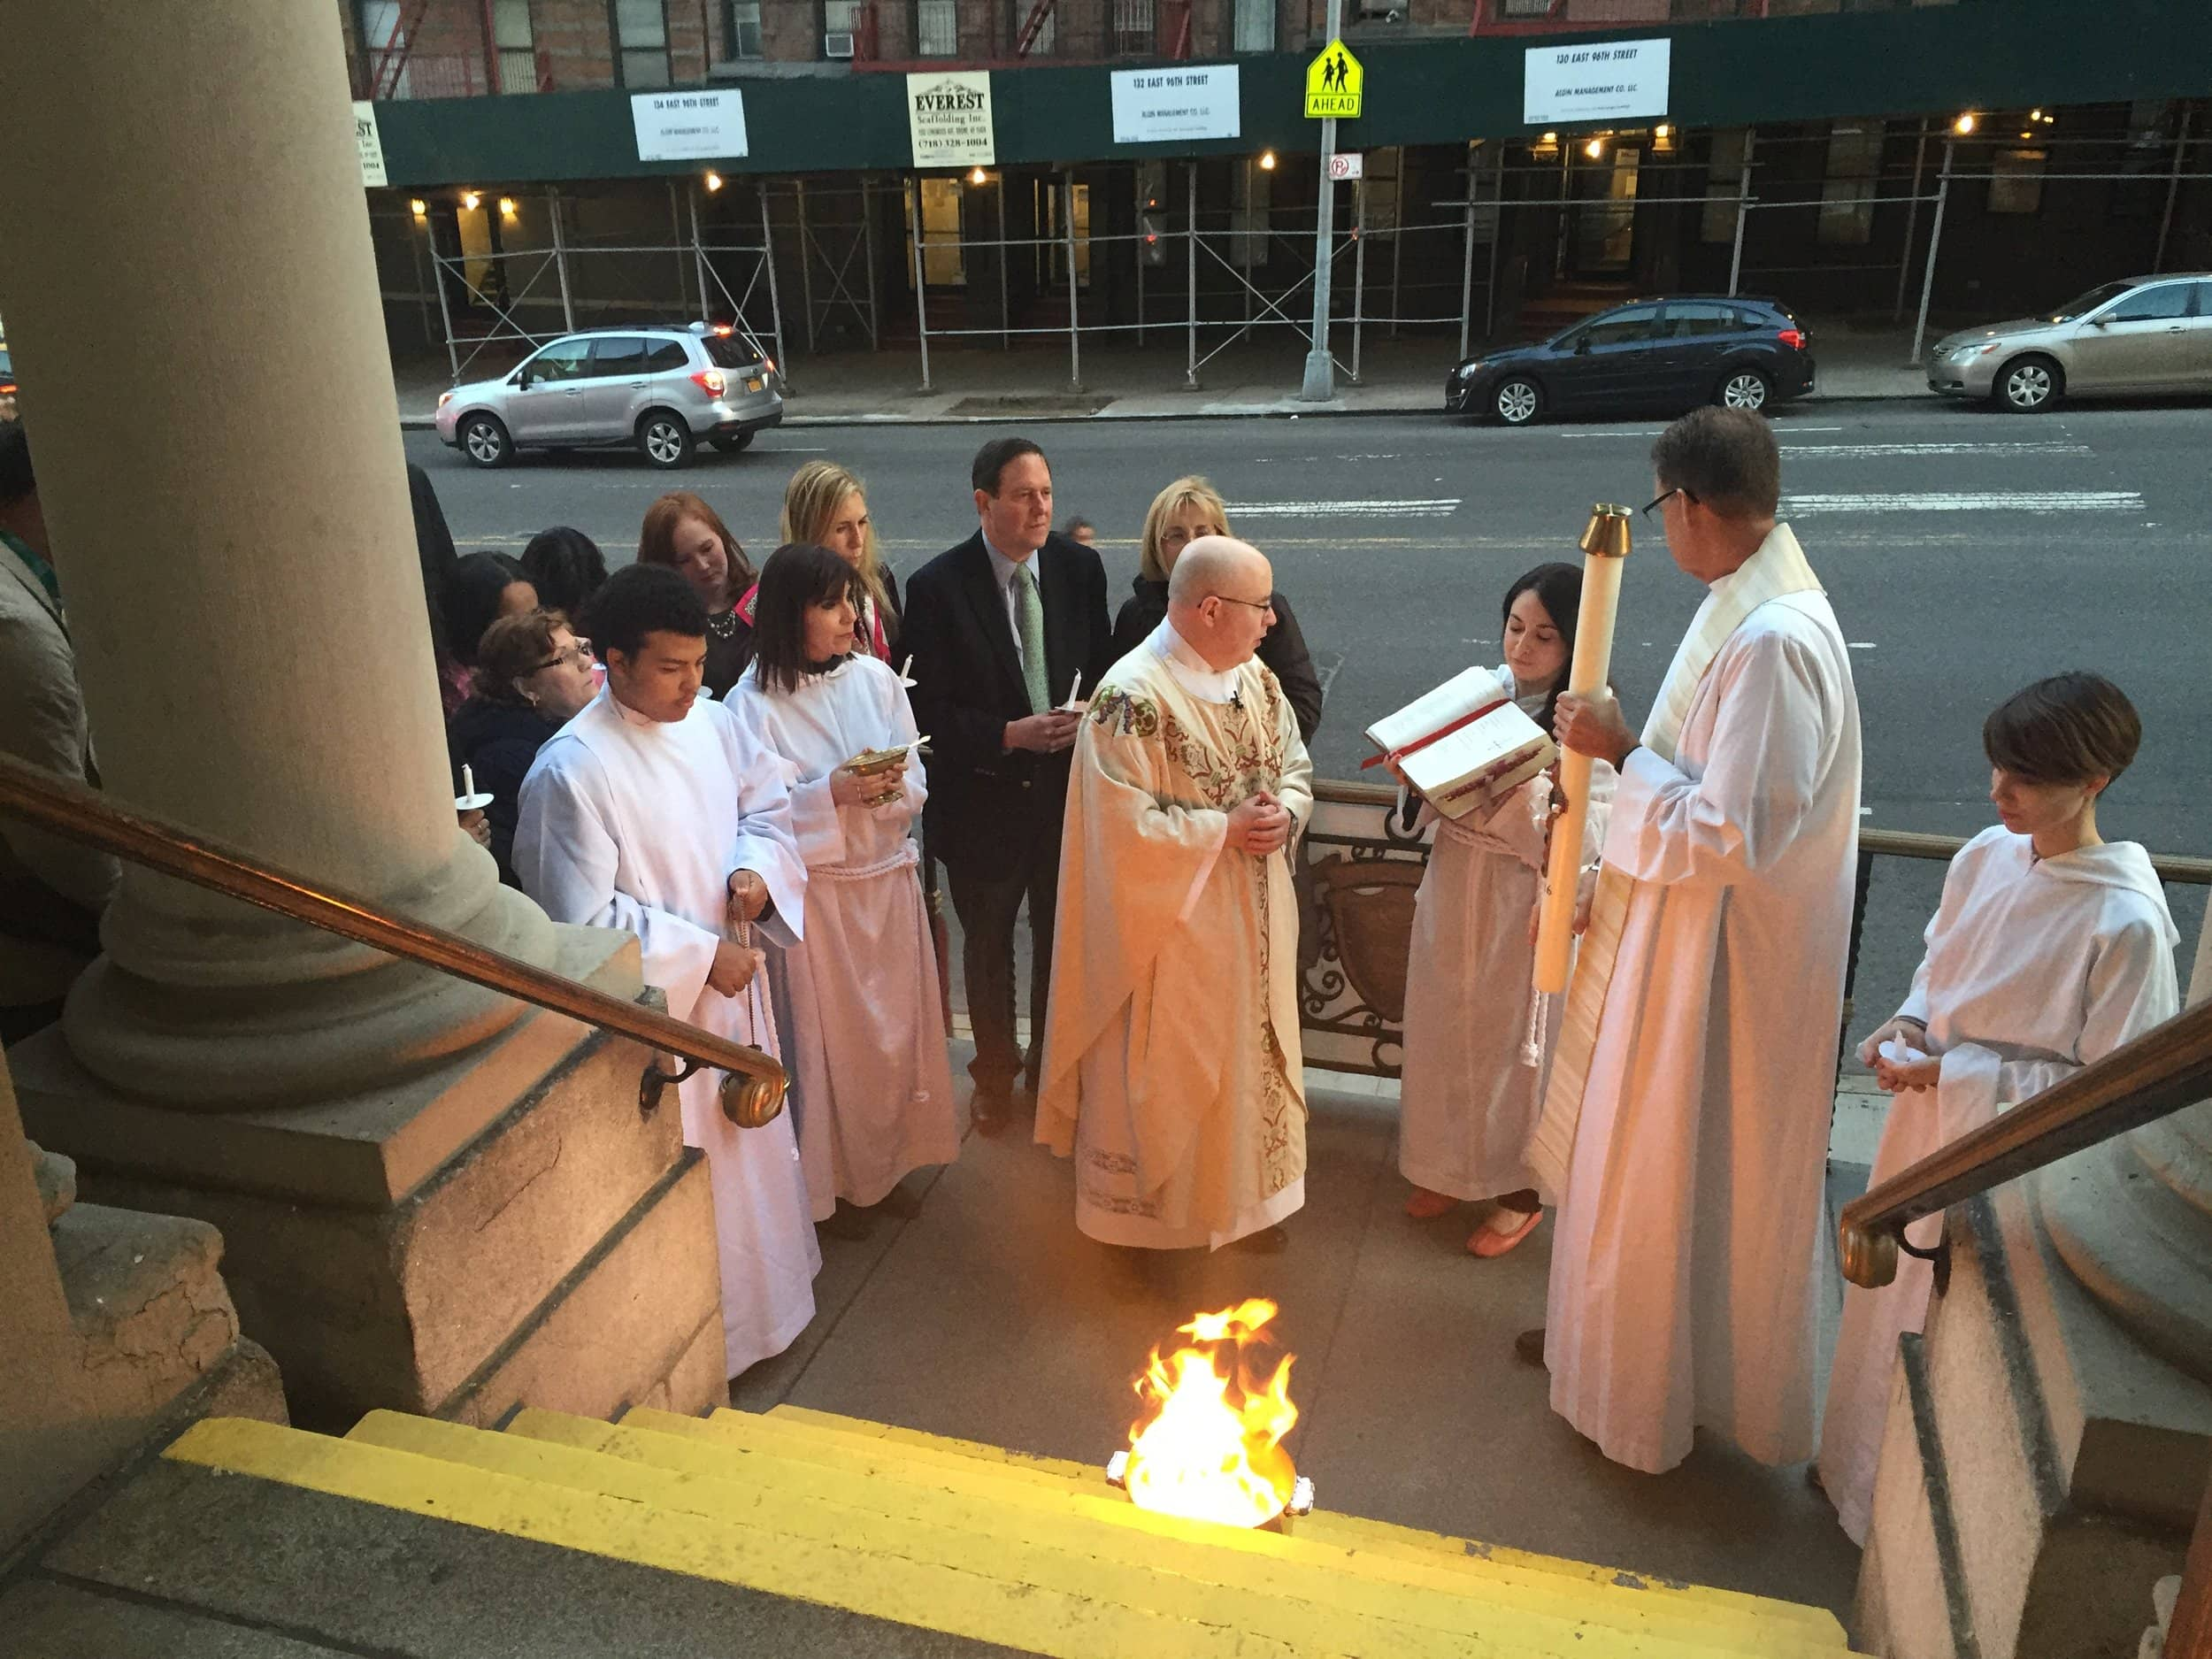 easter-vigil-st-francis-de-sales-church-new-york-city.jpg